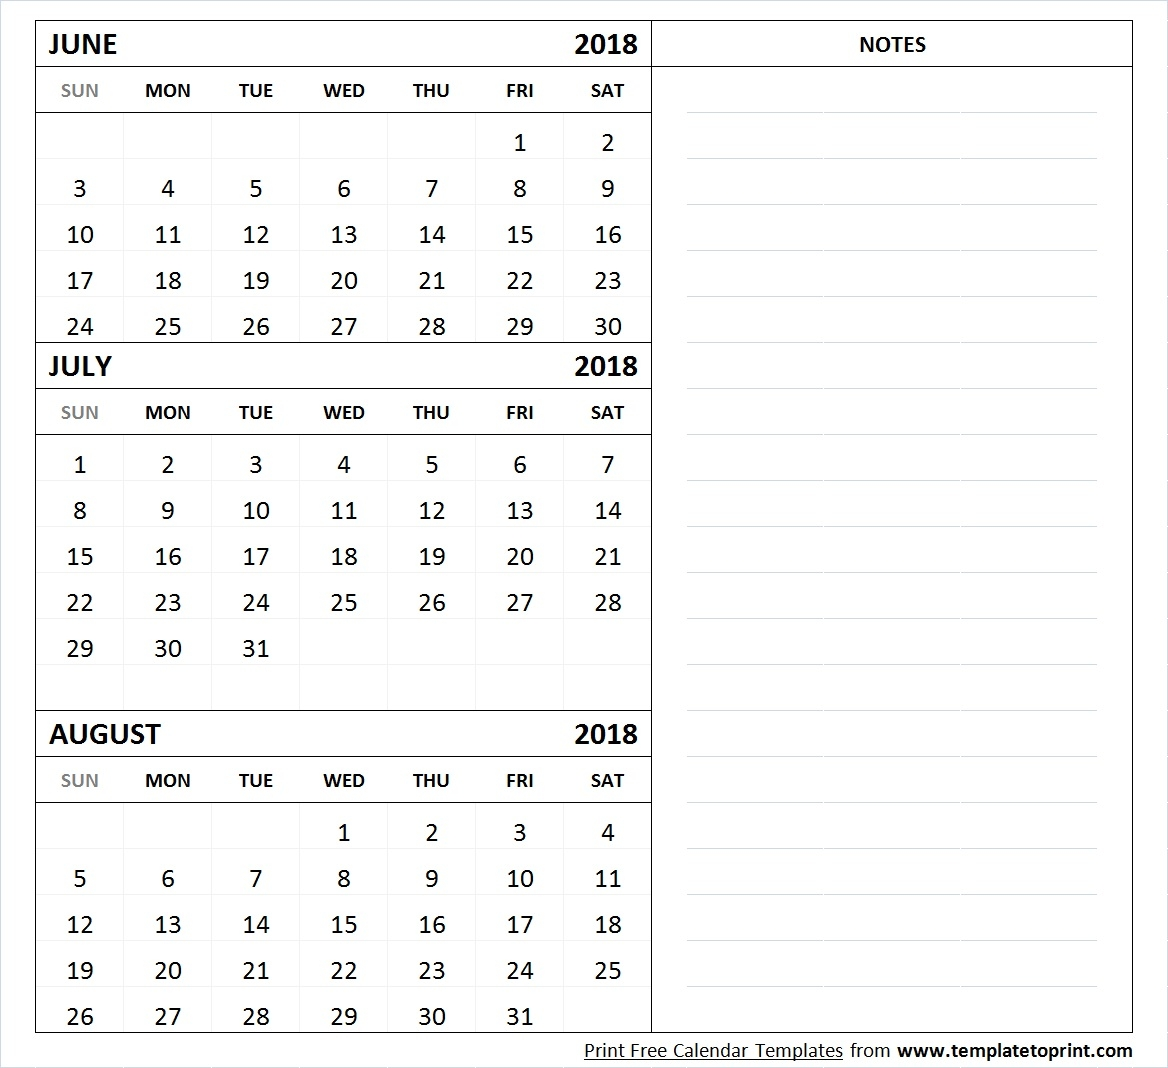 June July August 2018 Calendar Template Printable 3 Month Calendar3abry